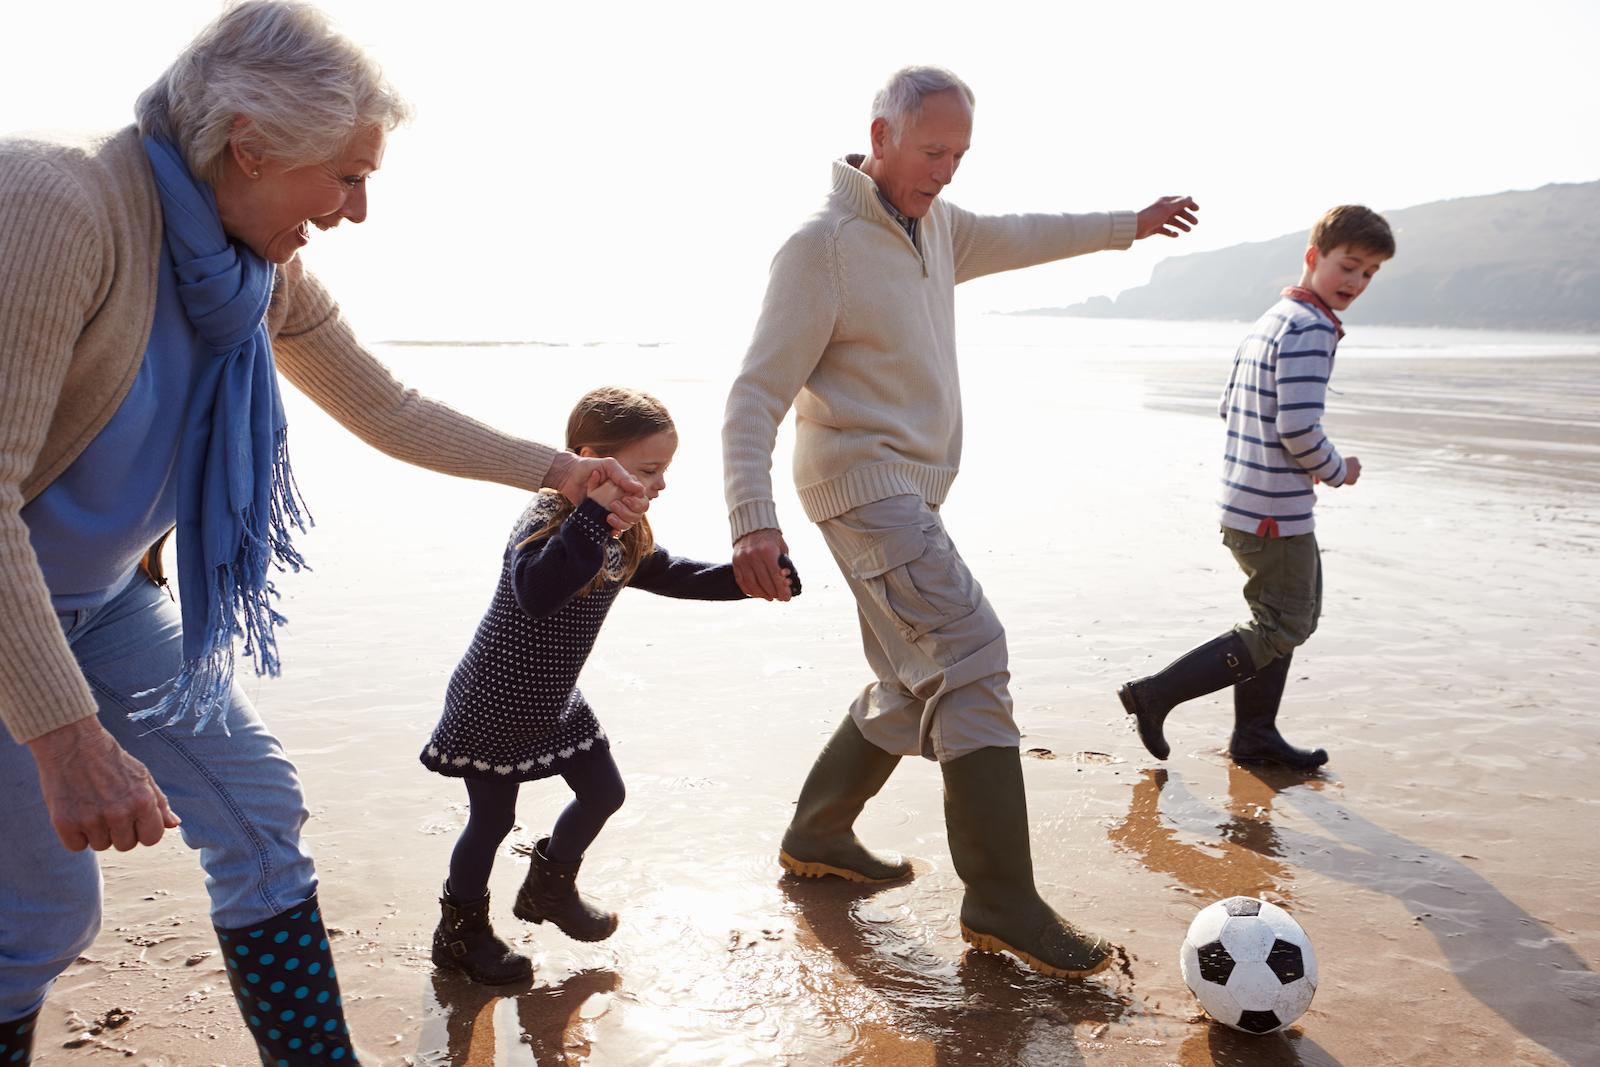 Grandparents enjoying Grandkids on beach stress free ATO